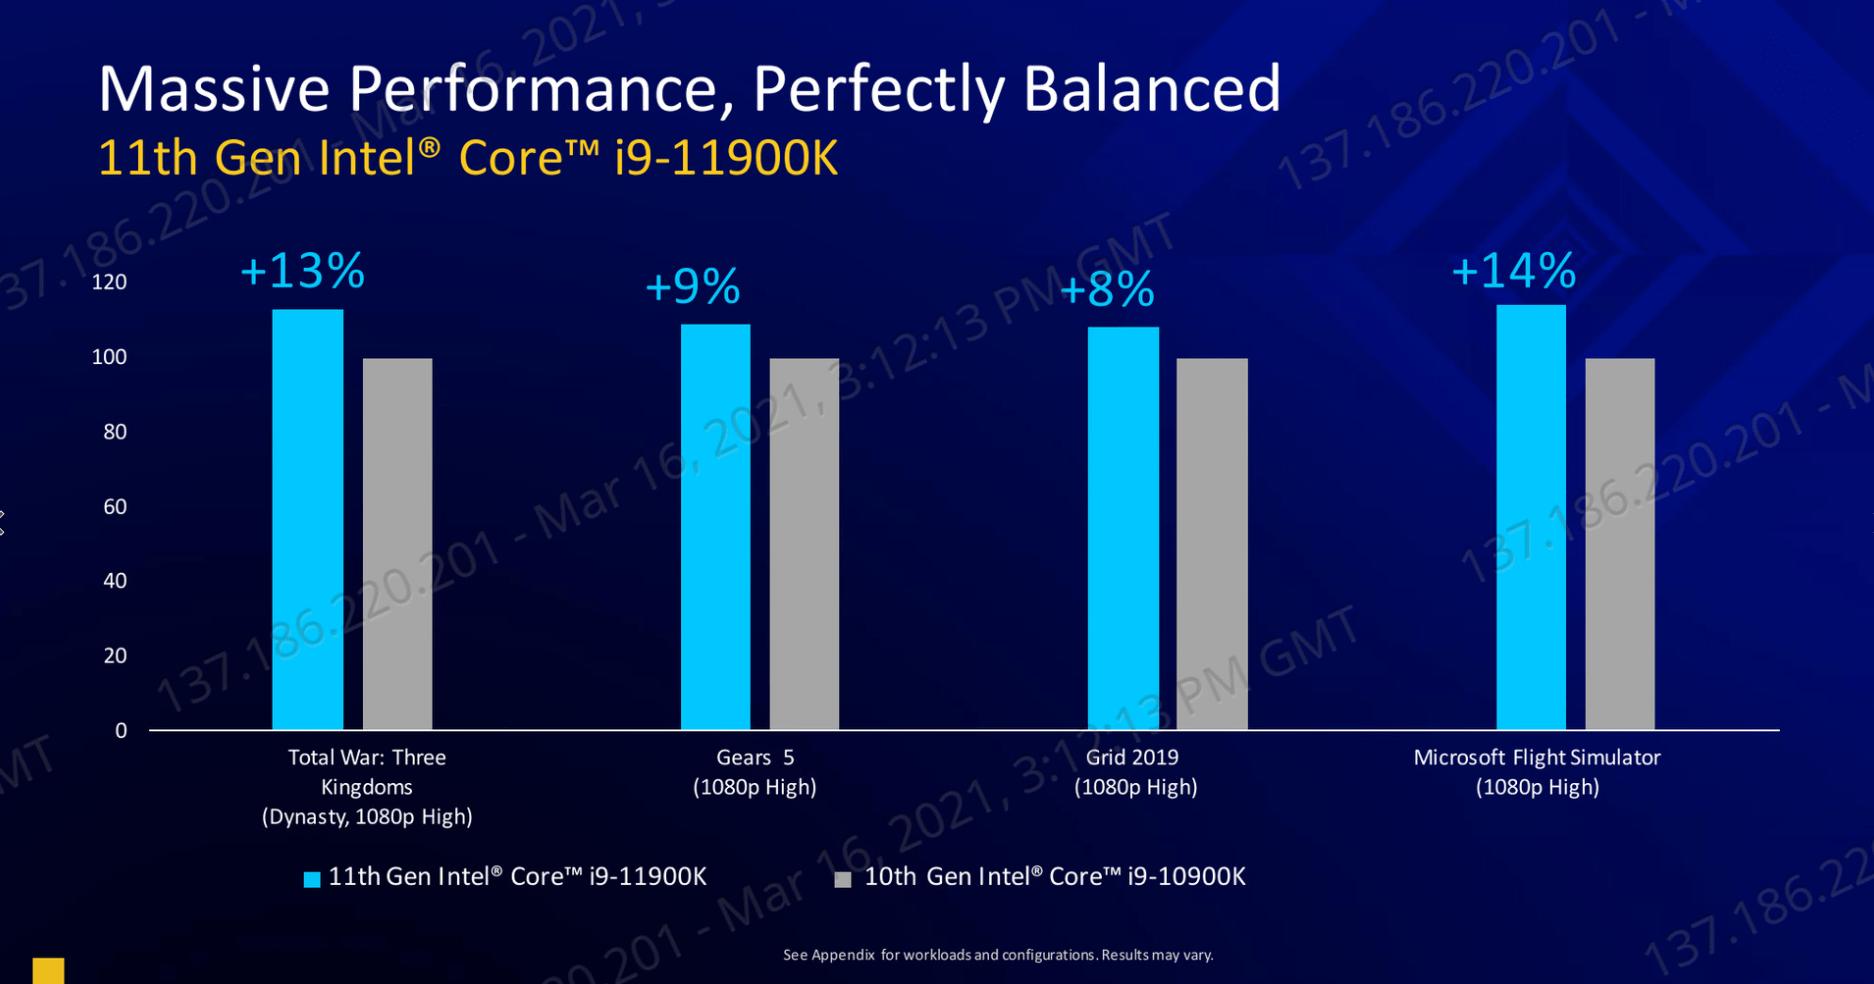 Intels Rocket Lake 11900K Peformance - 11th Gen Intel Rocket Lake-S